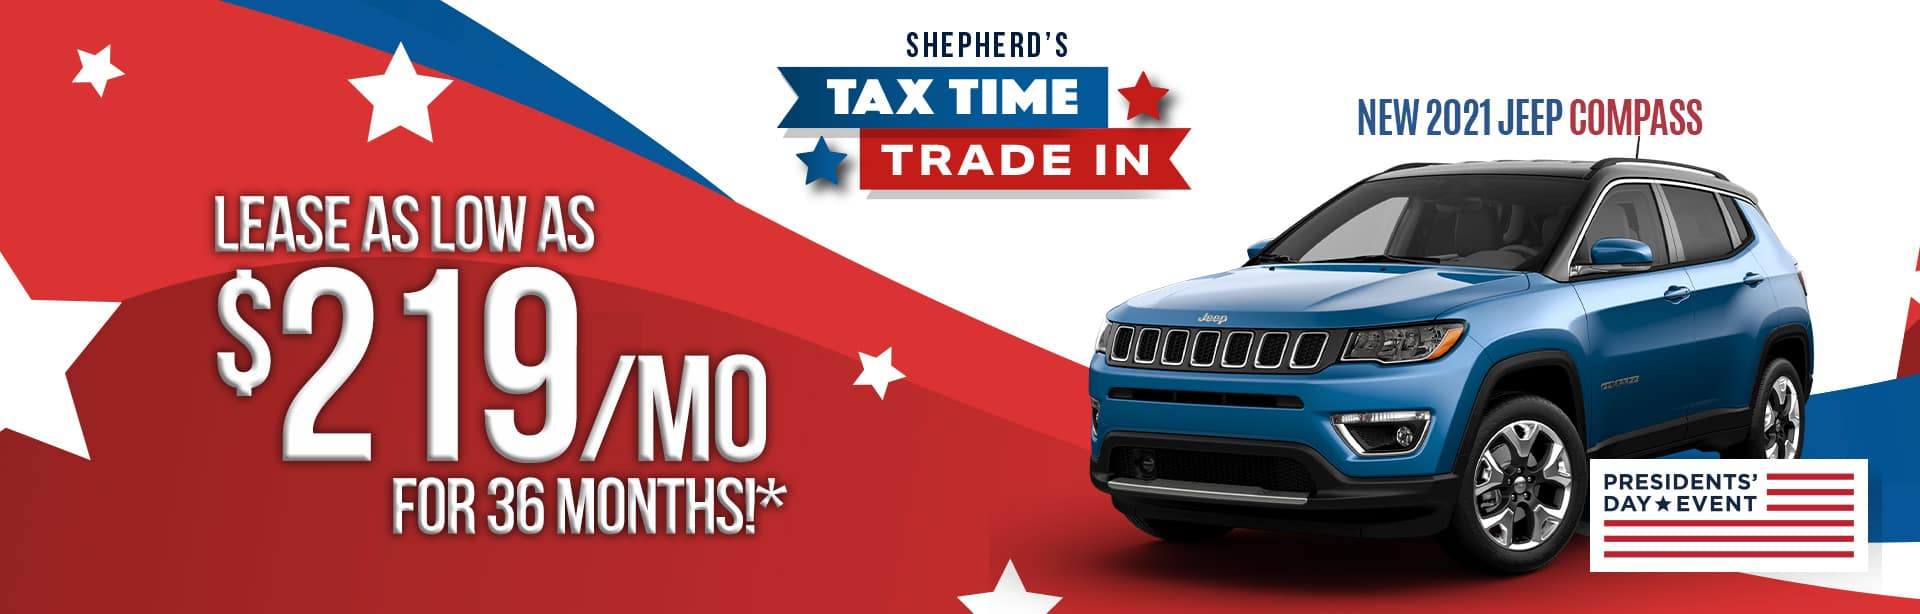 Best lease deal on a new 2021 Jeep Compass near Auburn Indiana